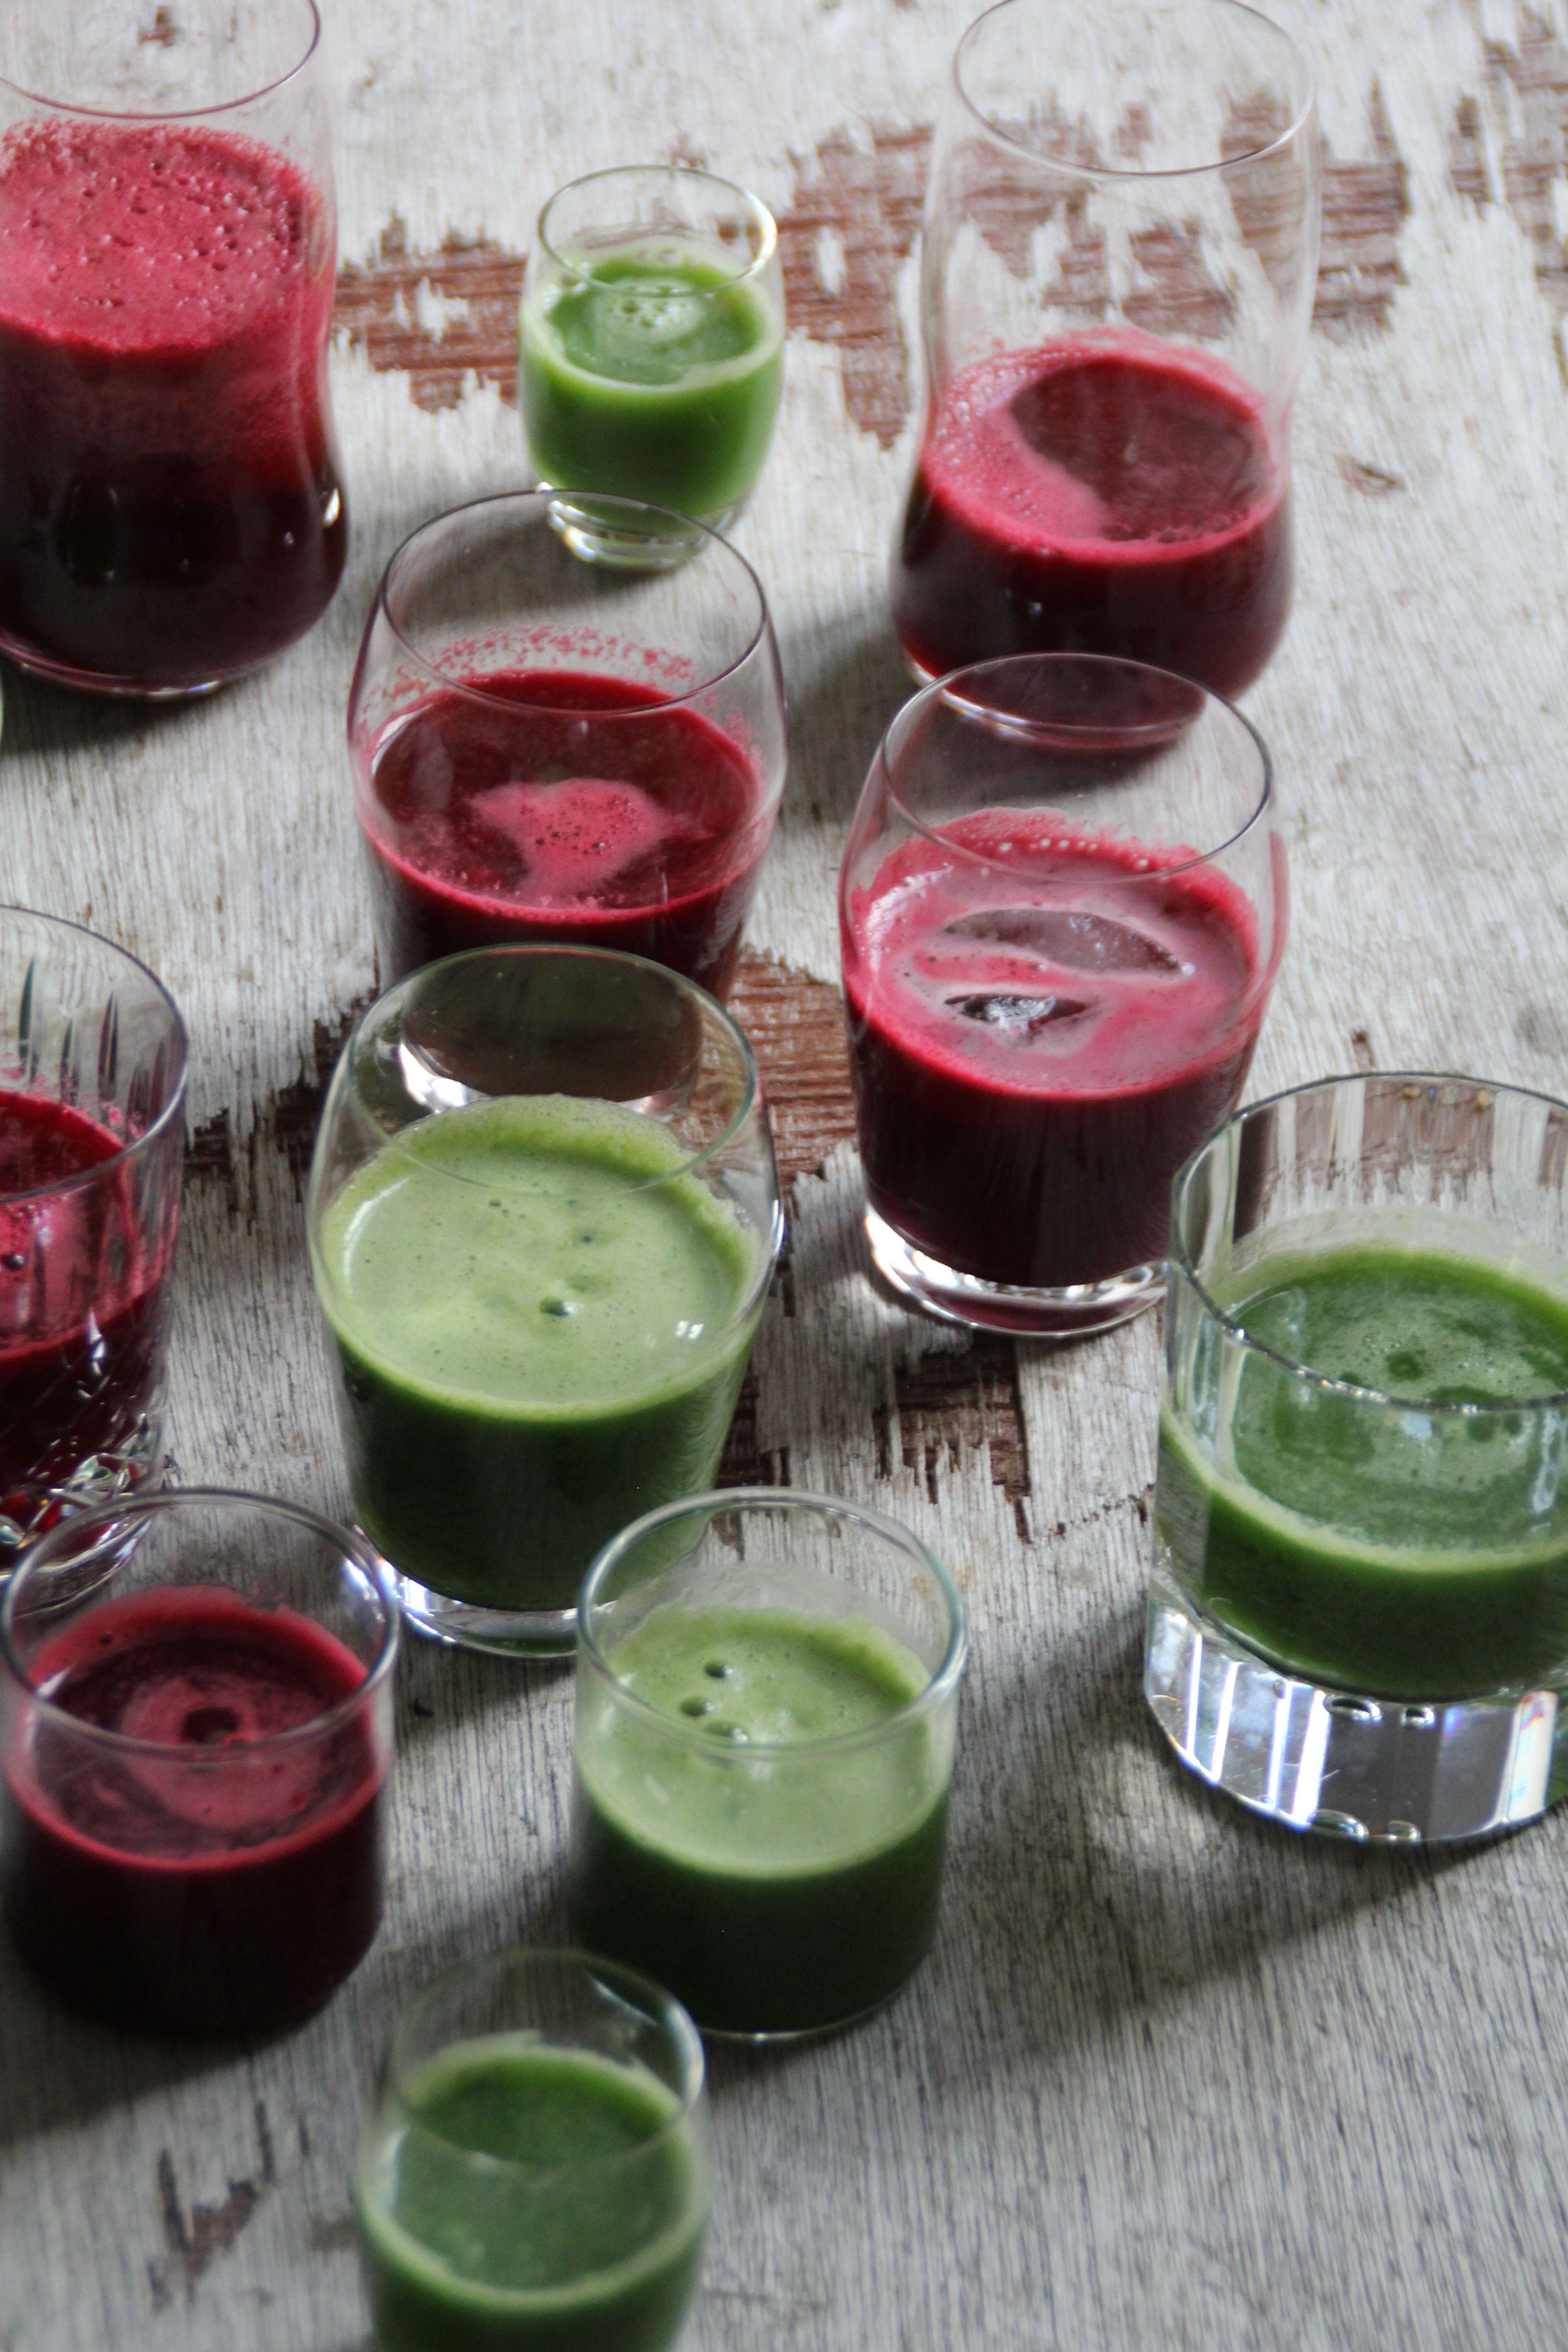 Rødbete- og grønnkåljuice